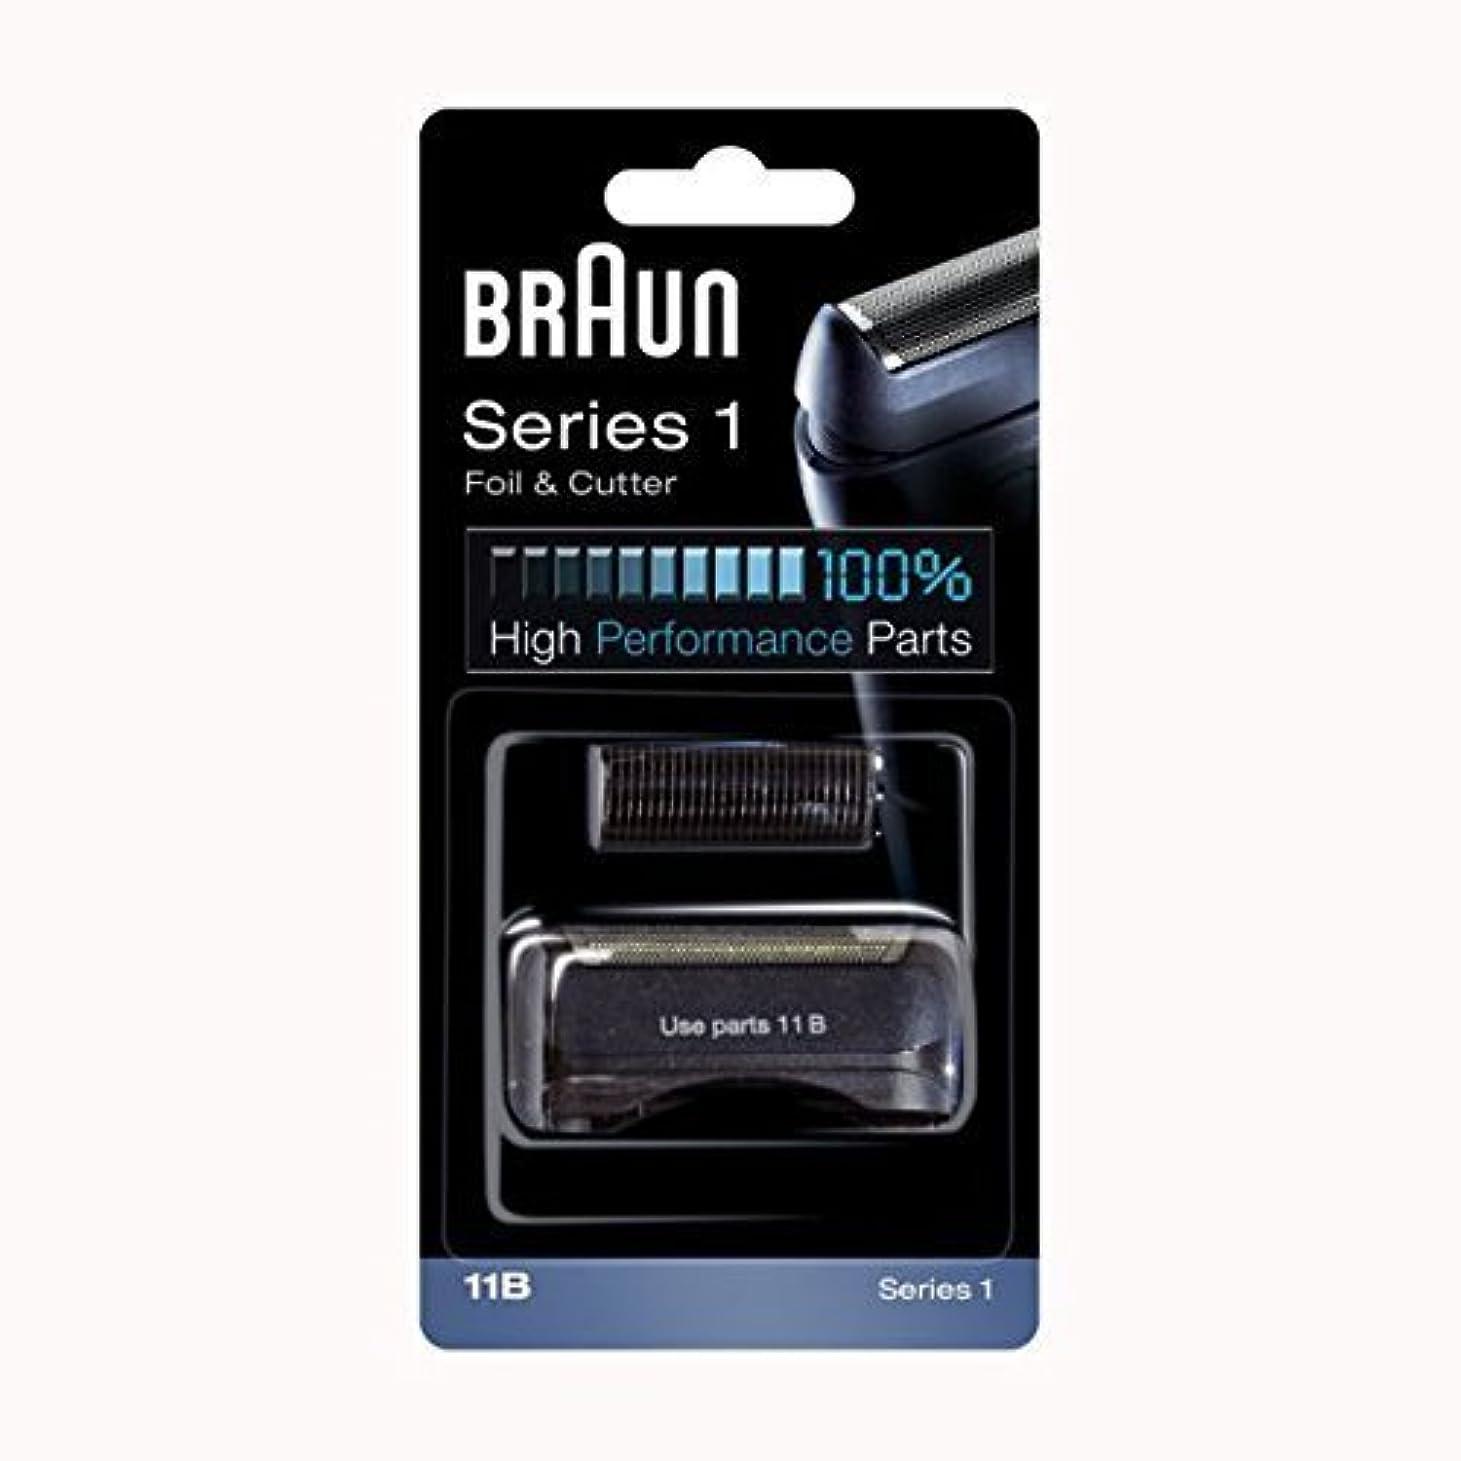 審判ペット保安Braun Series 150 Combipack 11B by Braun GmbH [並行輸入品]